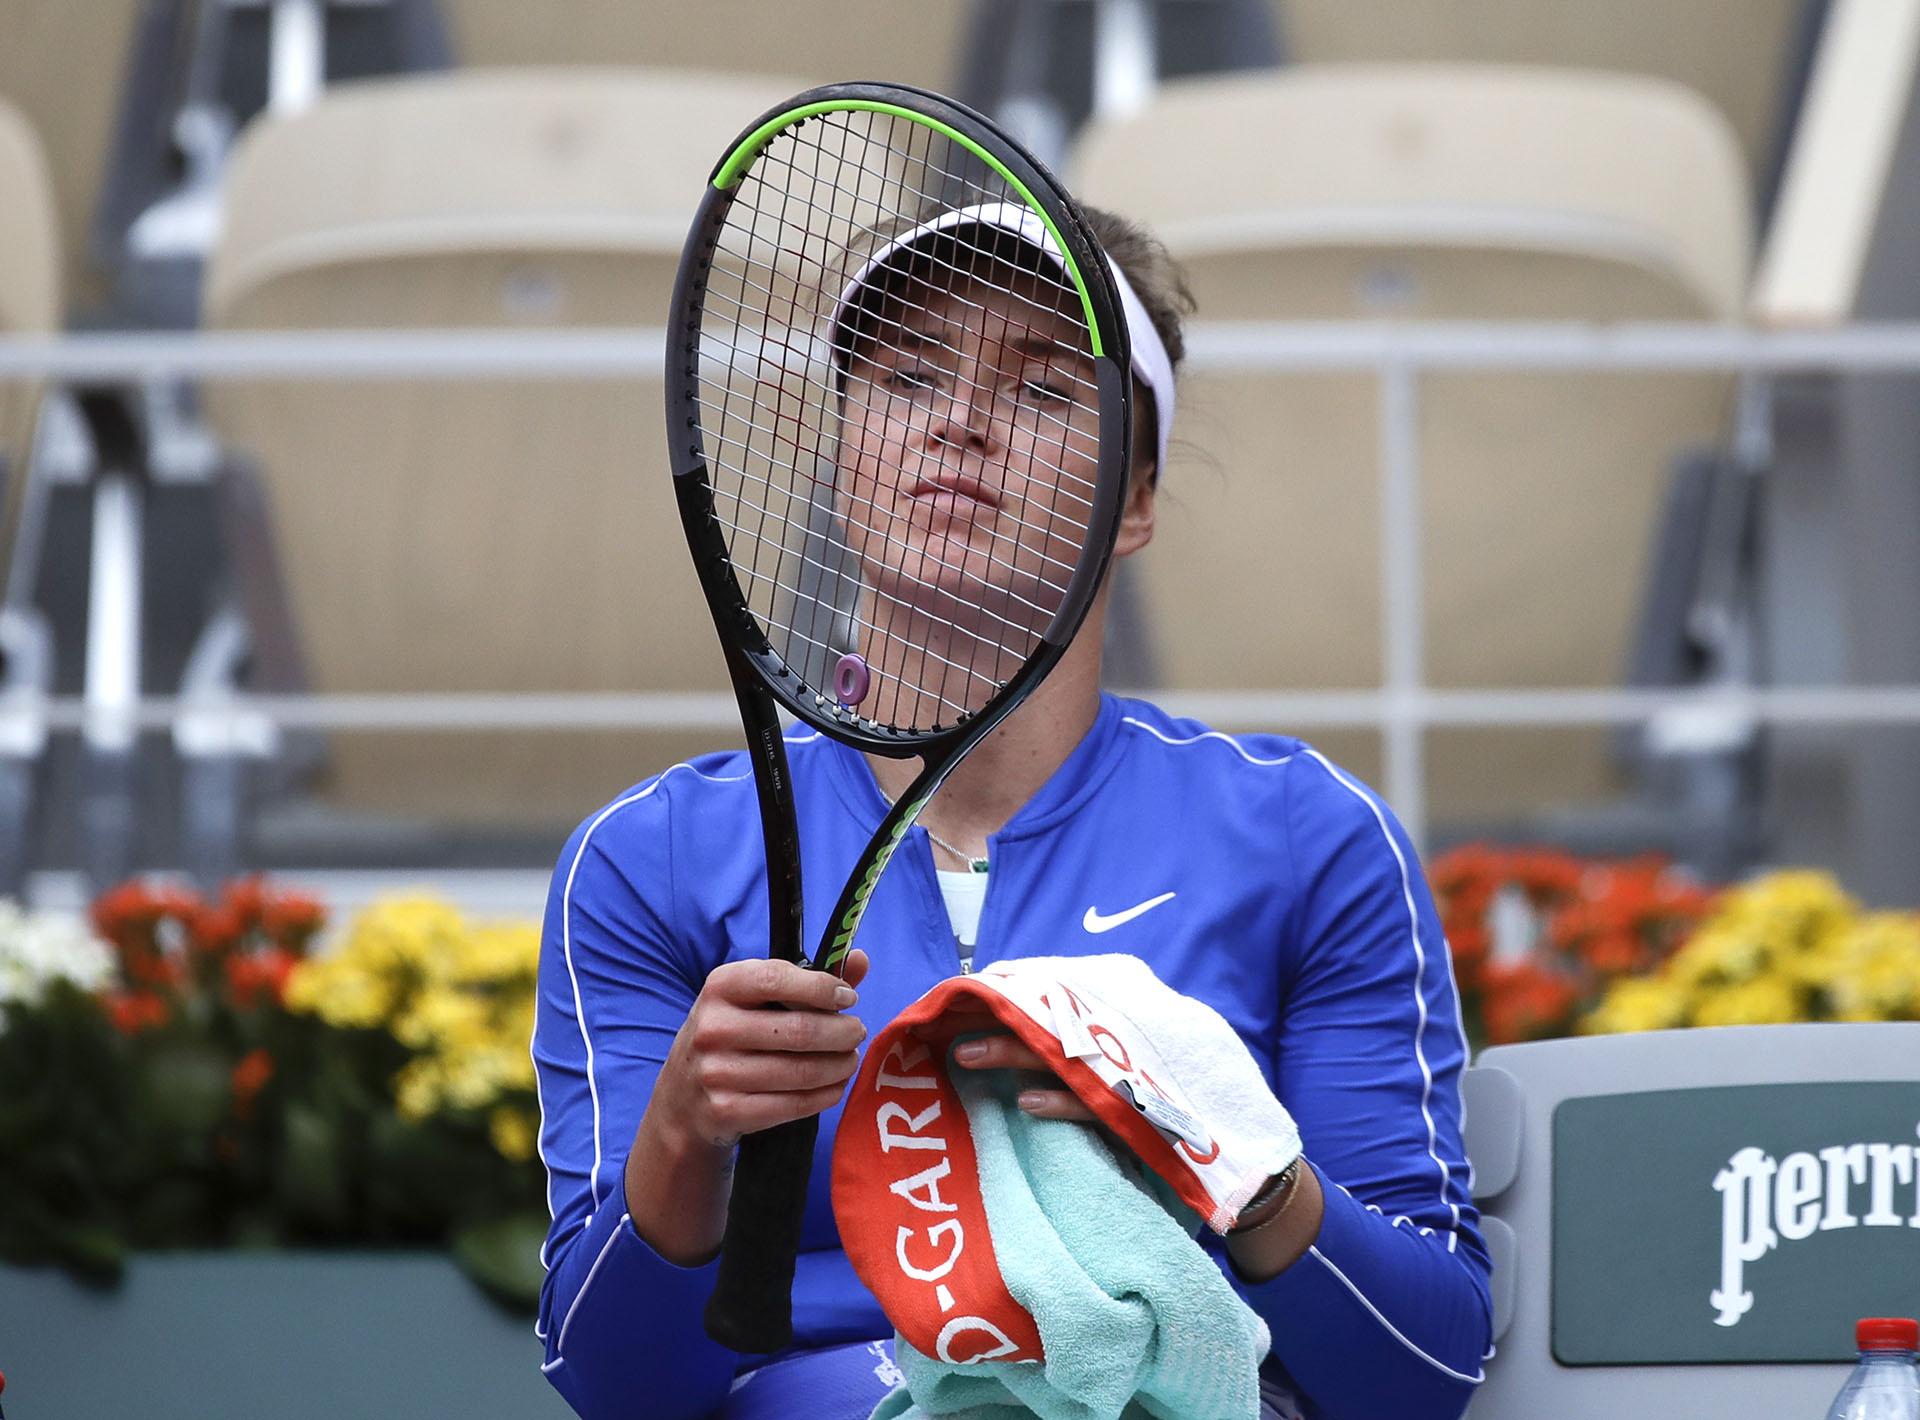 La ucraniana Svitolina es la número 5 del ranking mundial de la WTA (AP Photo/Alessandra Tarantino)